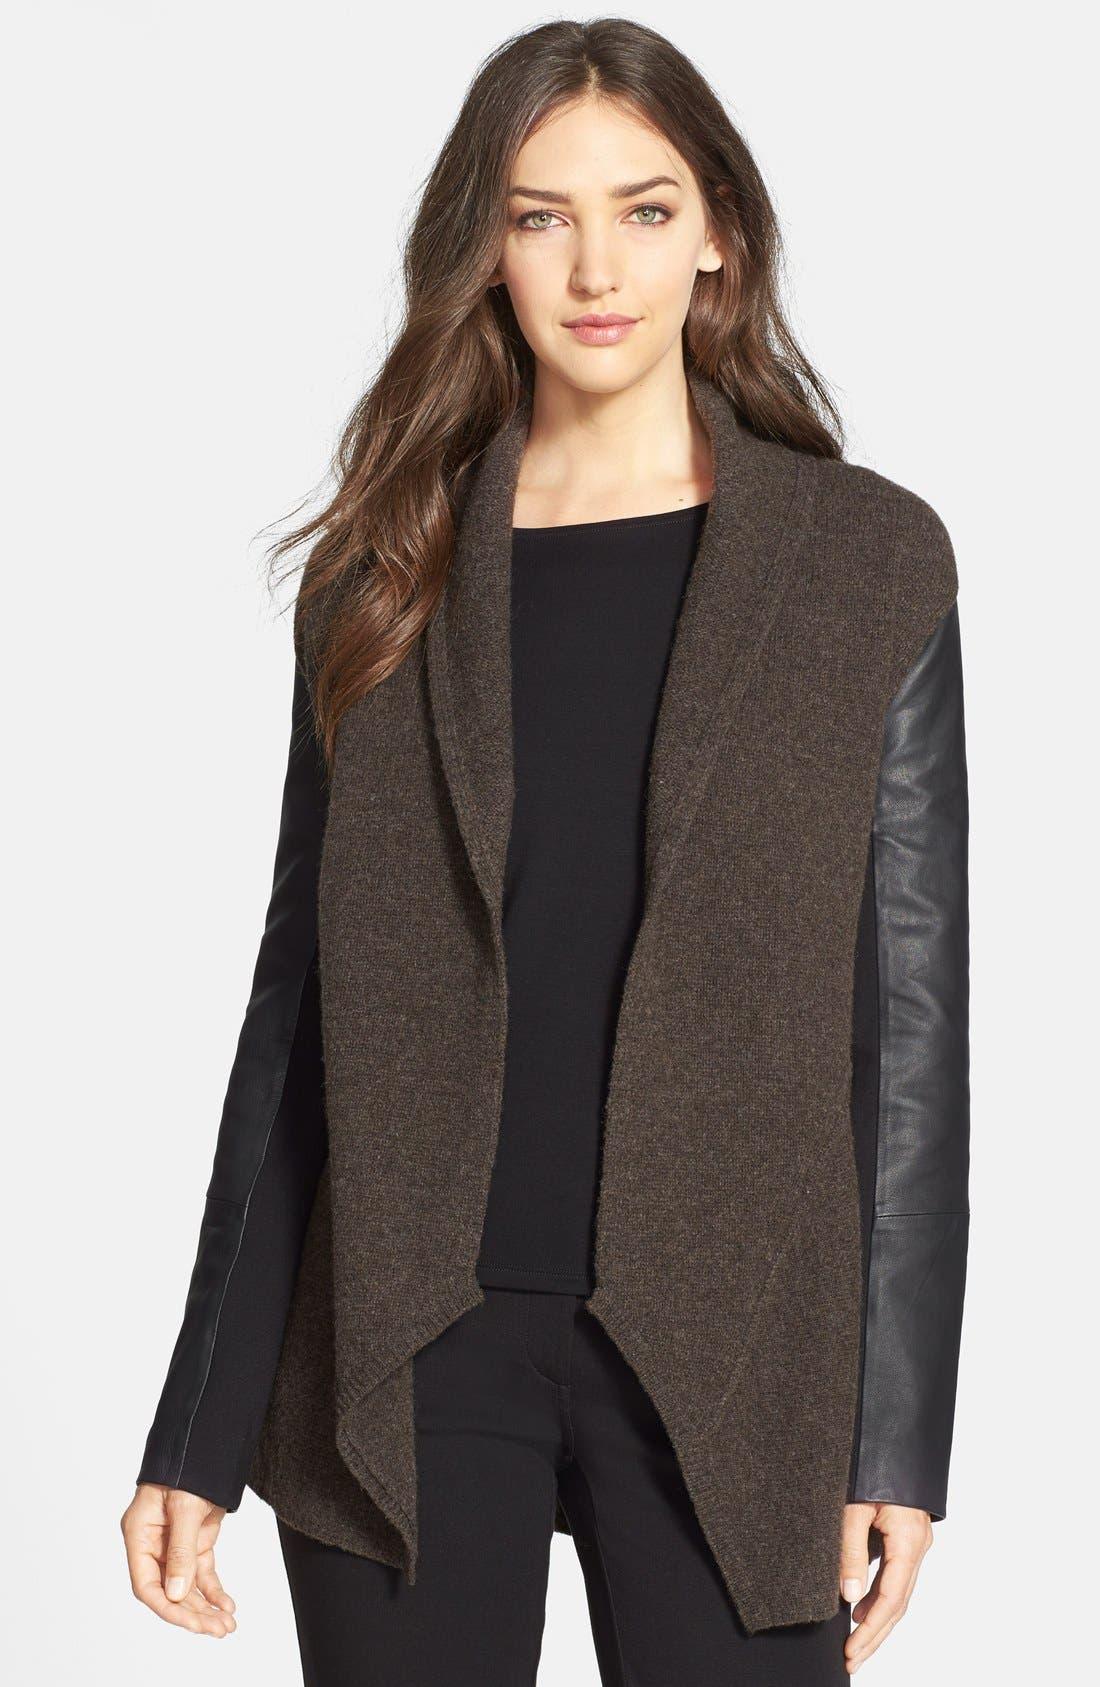 Alternate Image 1 Selected - Eileen Fisher Leather Sleeve Merino Lambswool Jacket (Regular & Petite)